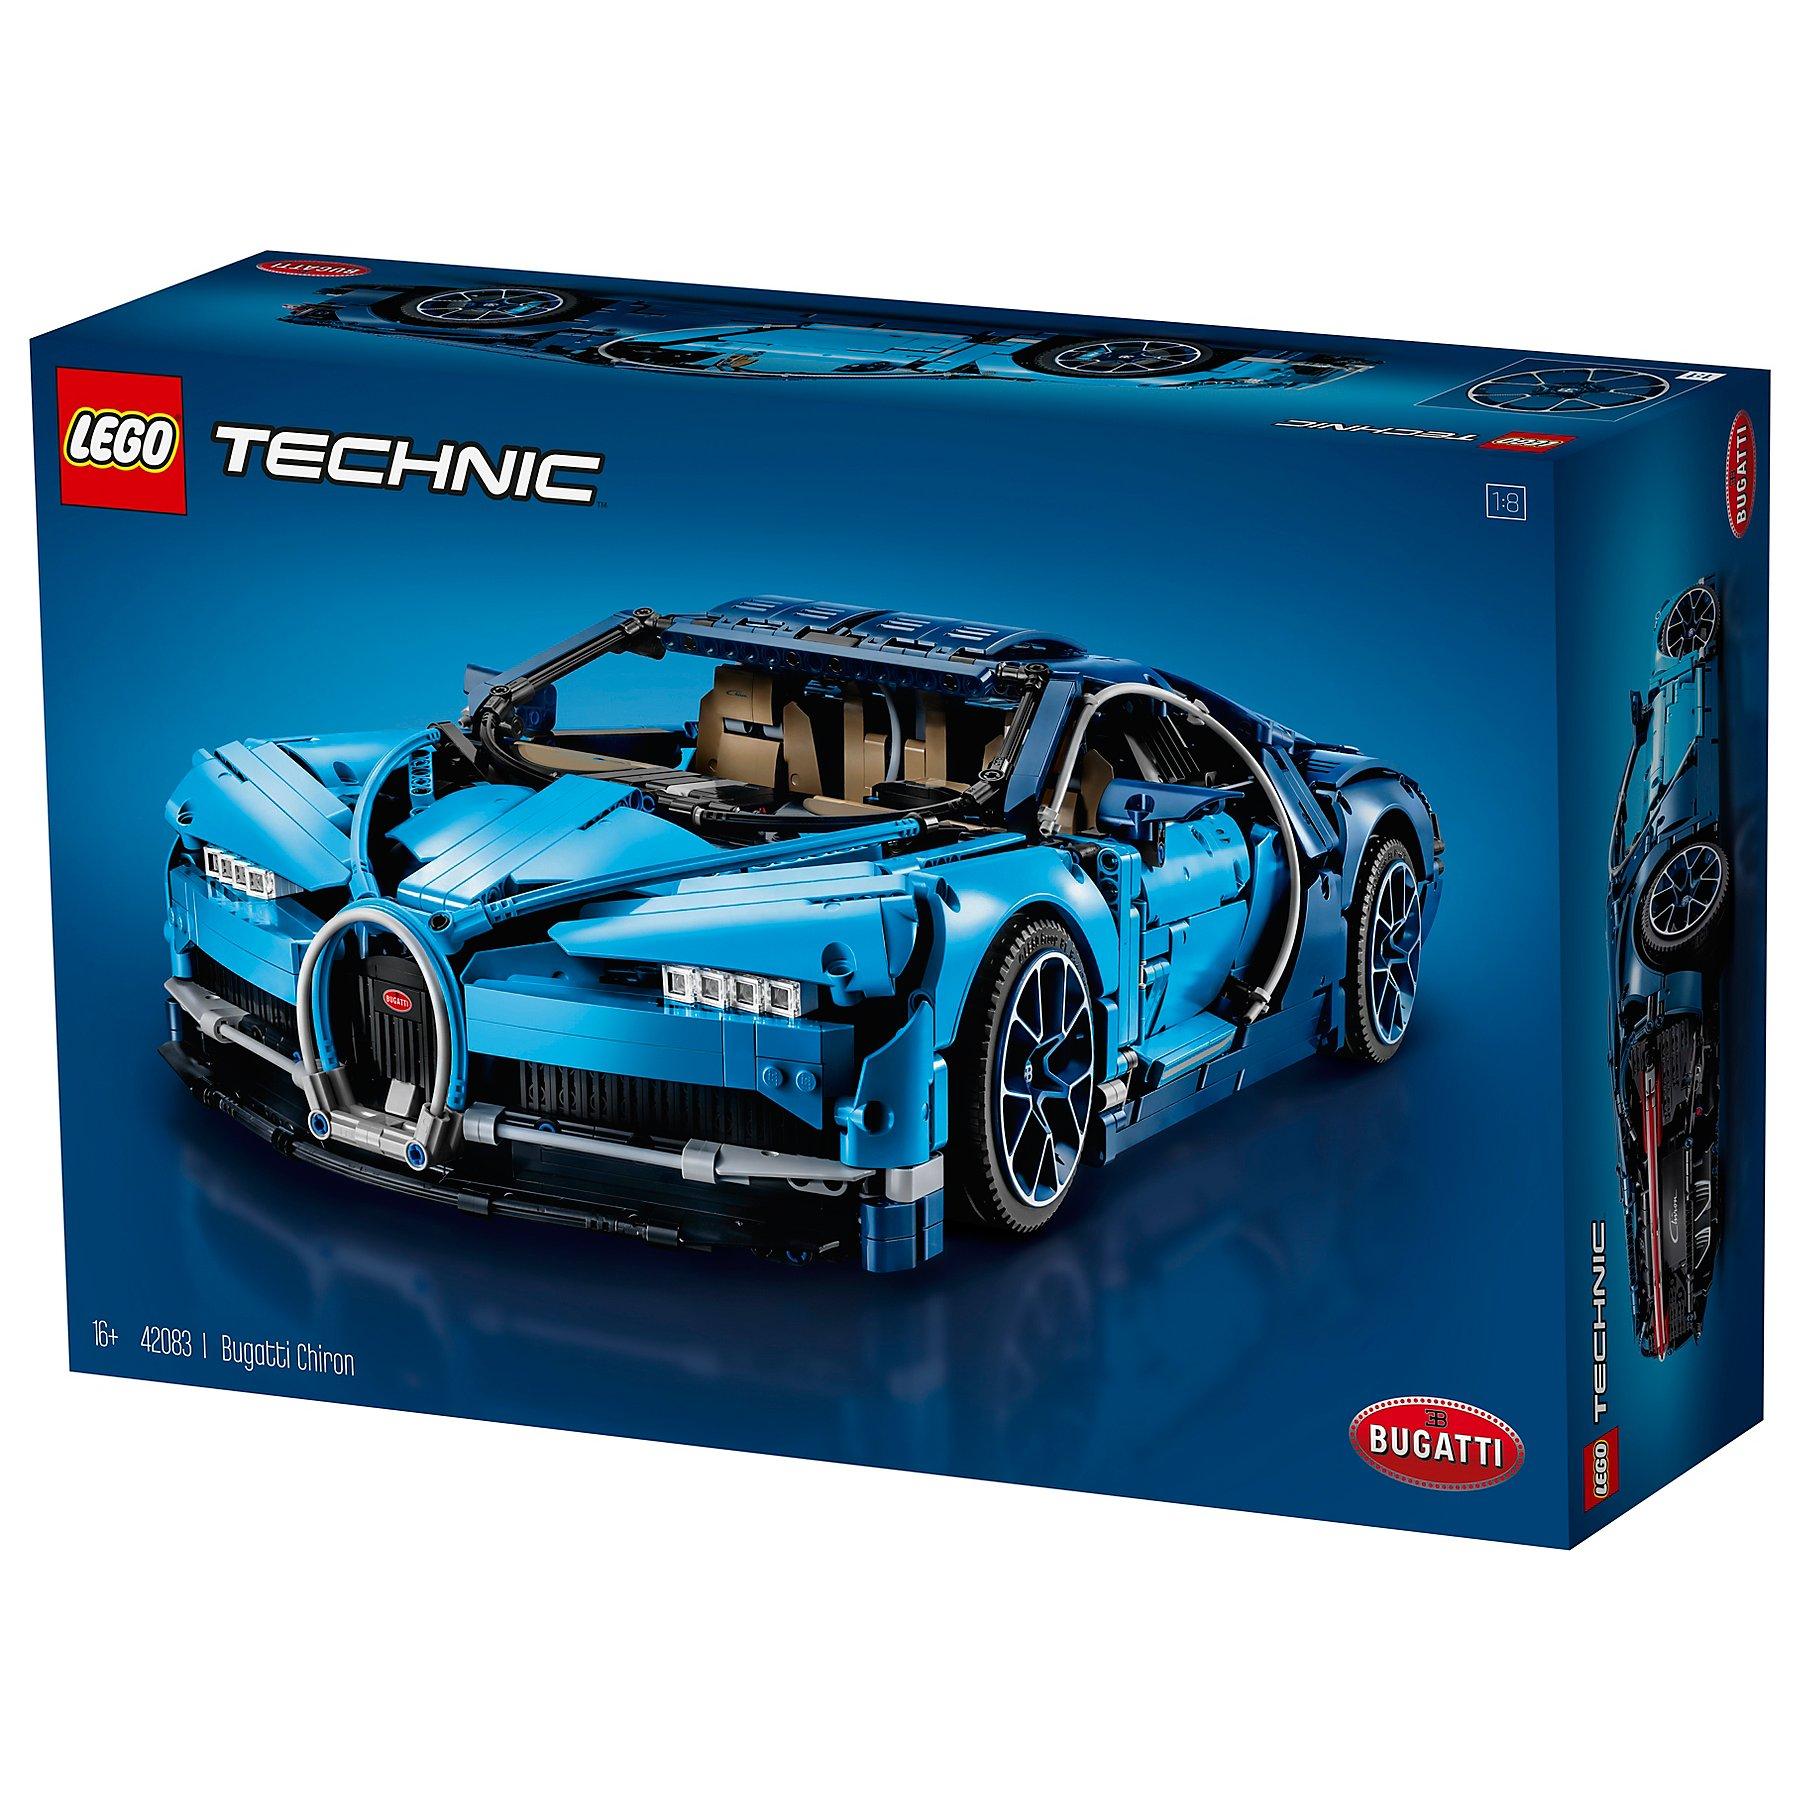 LEGO Technic - Bugatti - 42083 - £192.92 @ Asda George